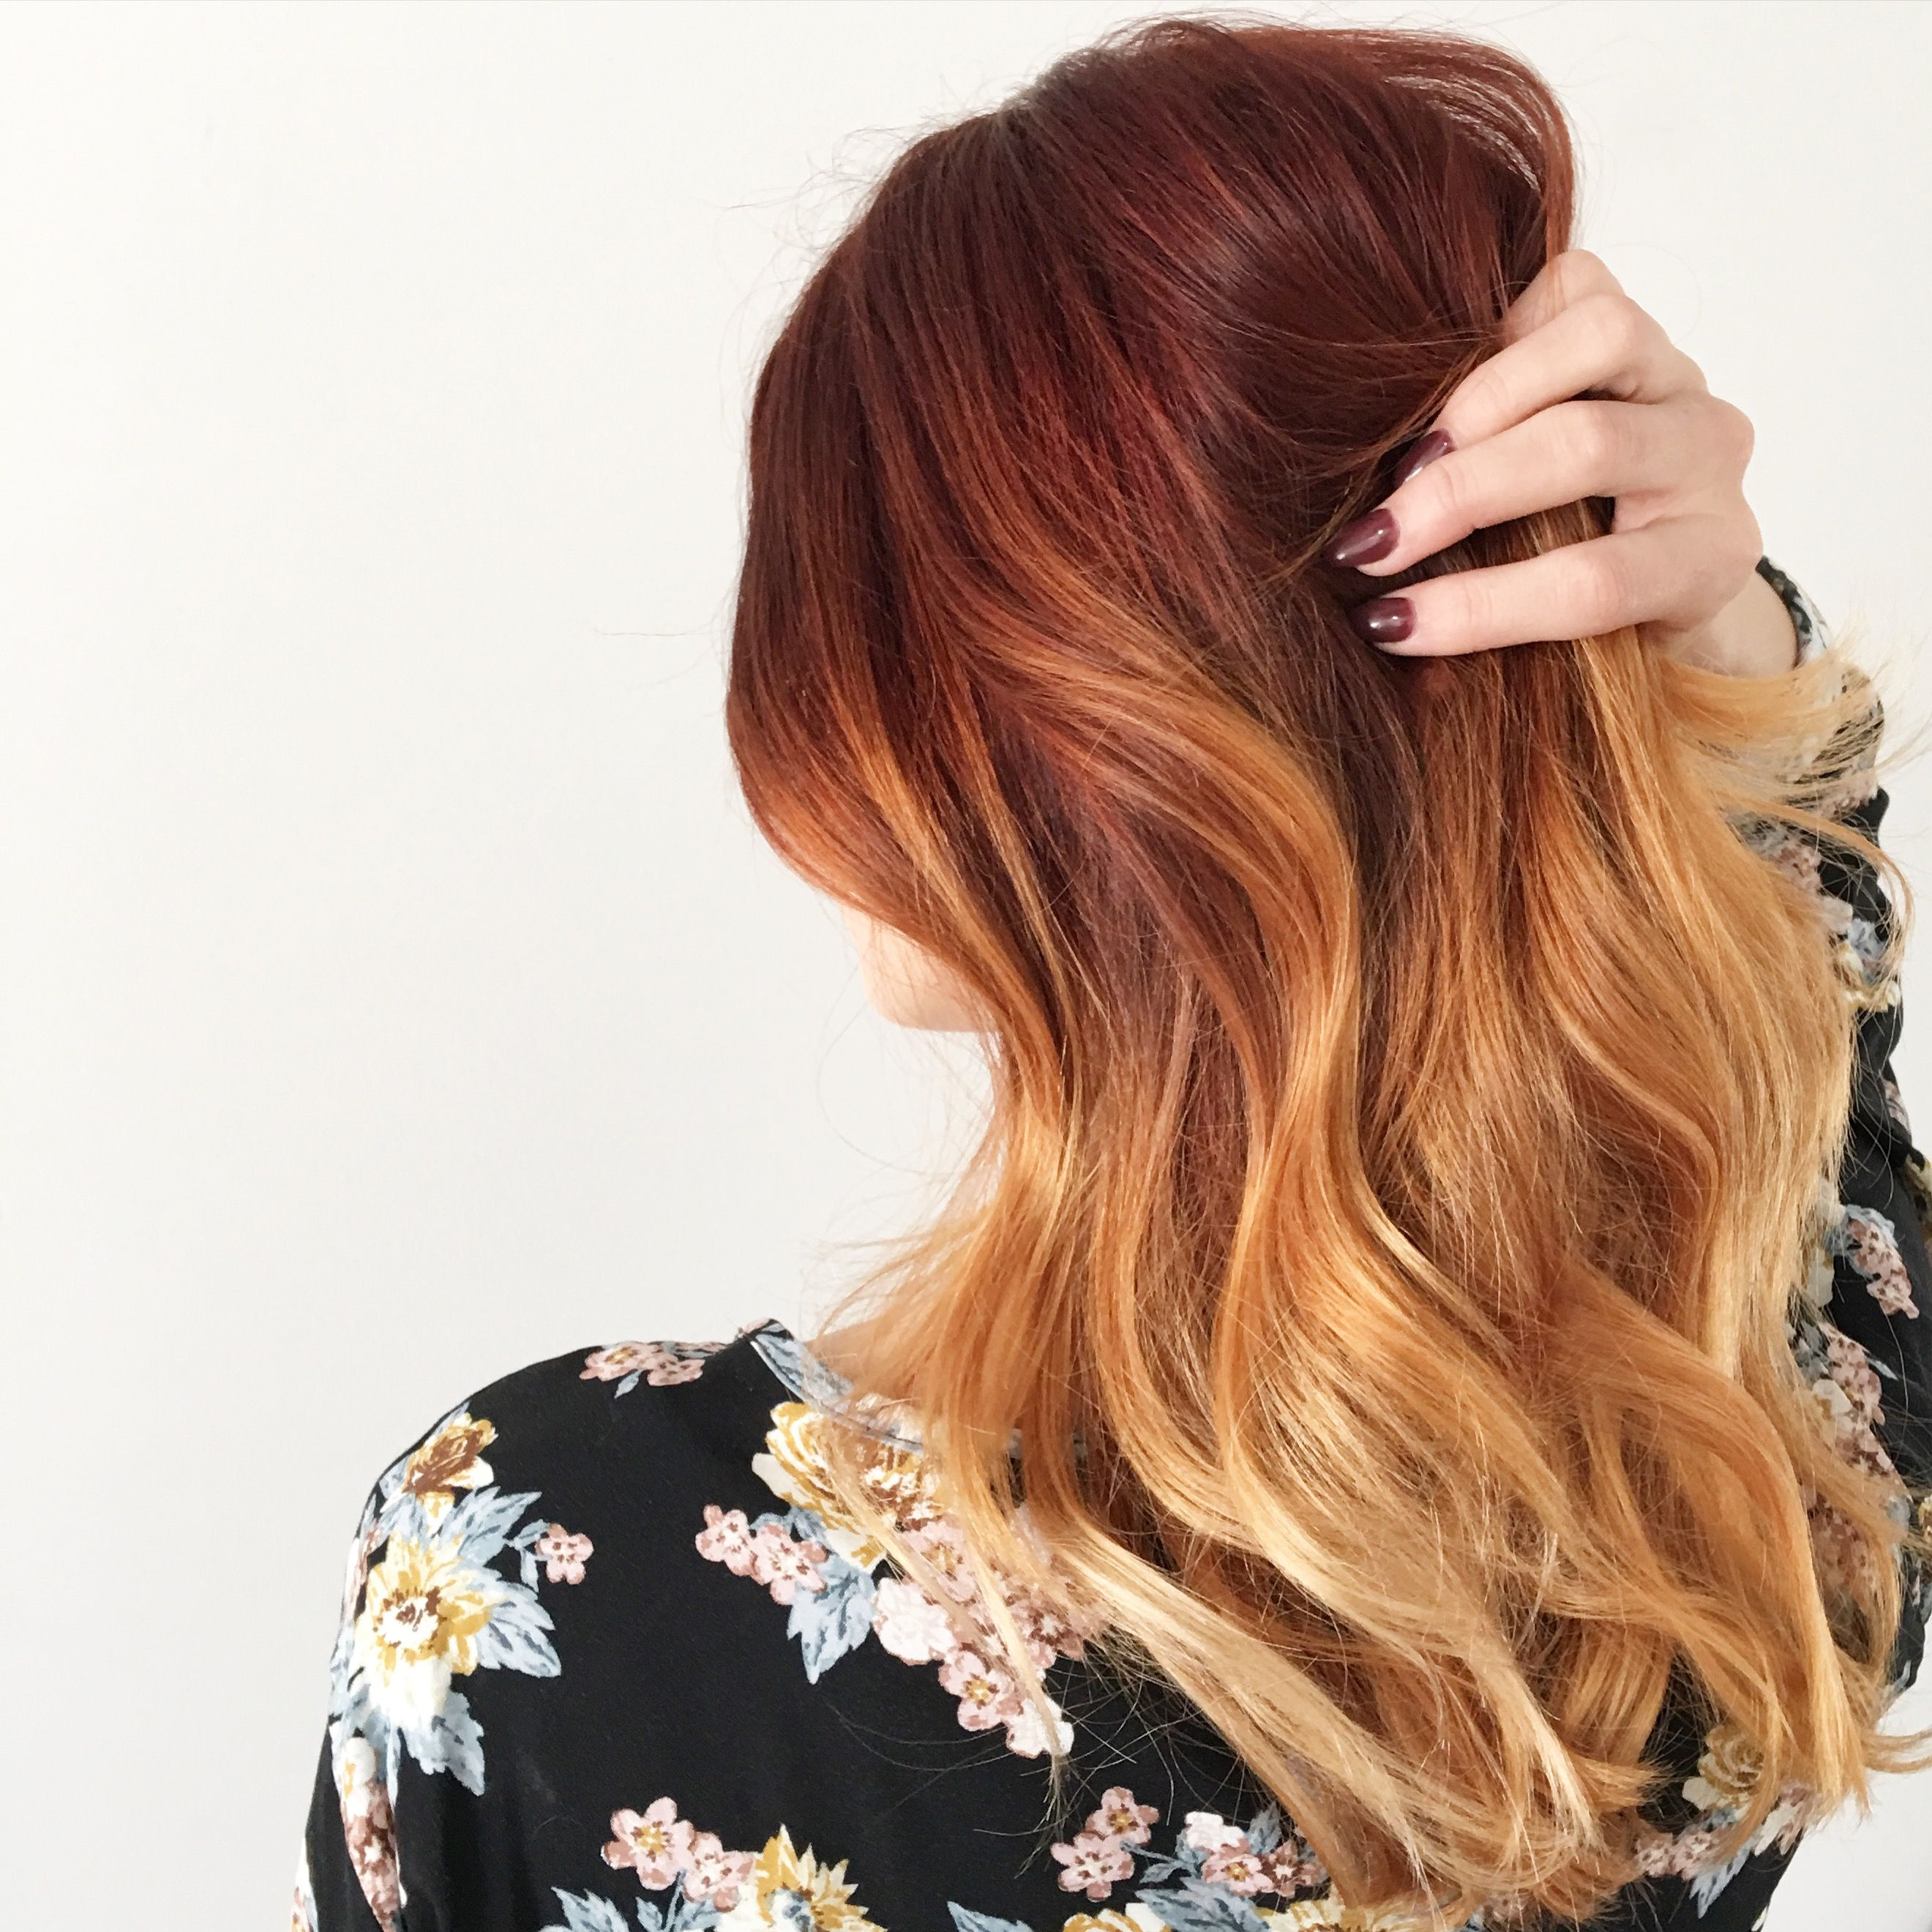 Balayage Red Highlight Hair Color on Blonde shedonteversleep